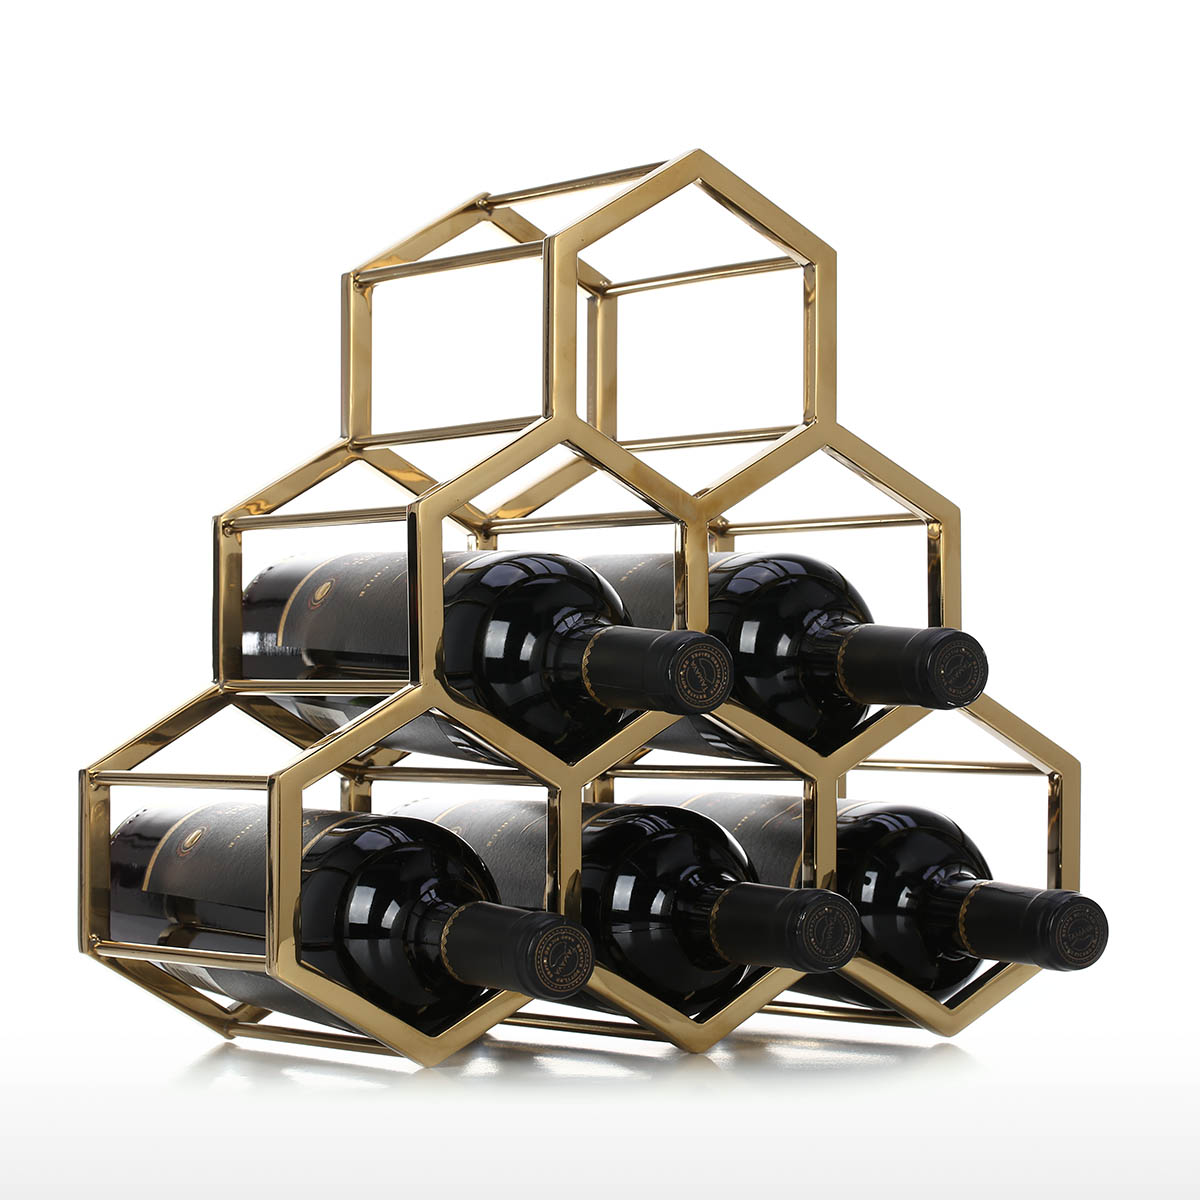 Modern Grapevine Design Black Freestanding Metal 12 Bottle Wine Storage Shelf Rack 3 Tier Wine Holder Wine Racks Cabinets Freestanding Wine Racks Cabinets